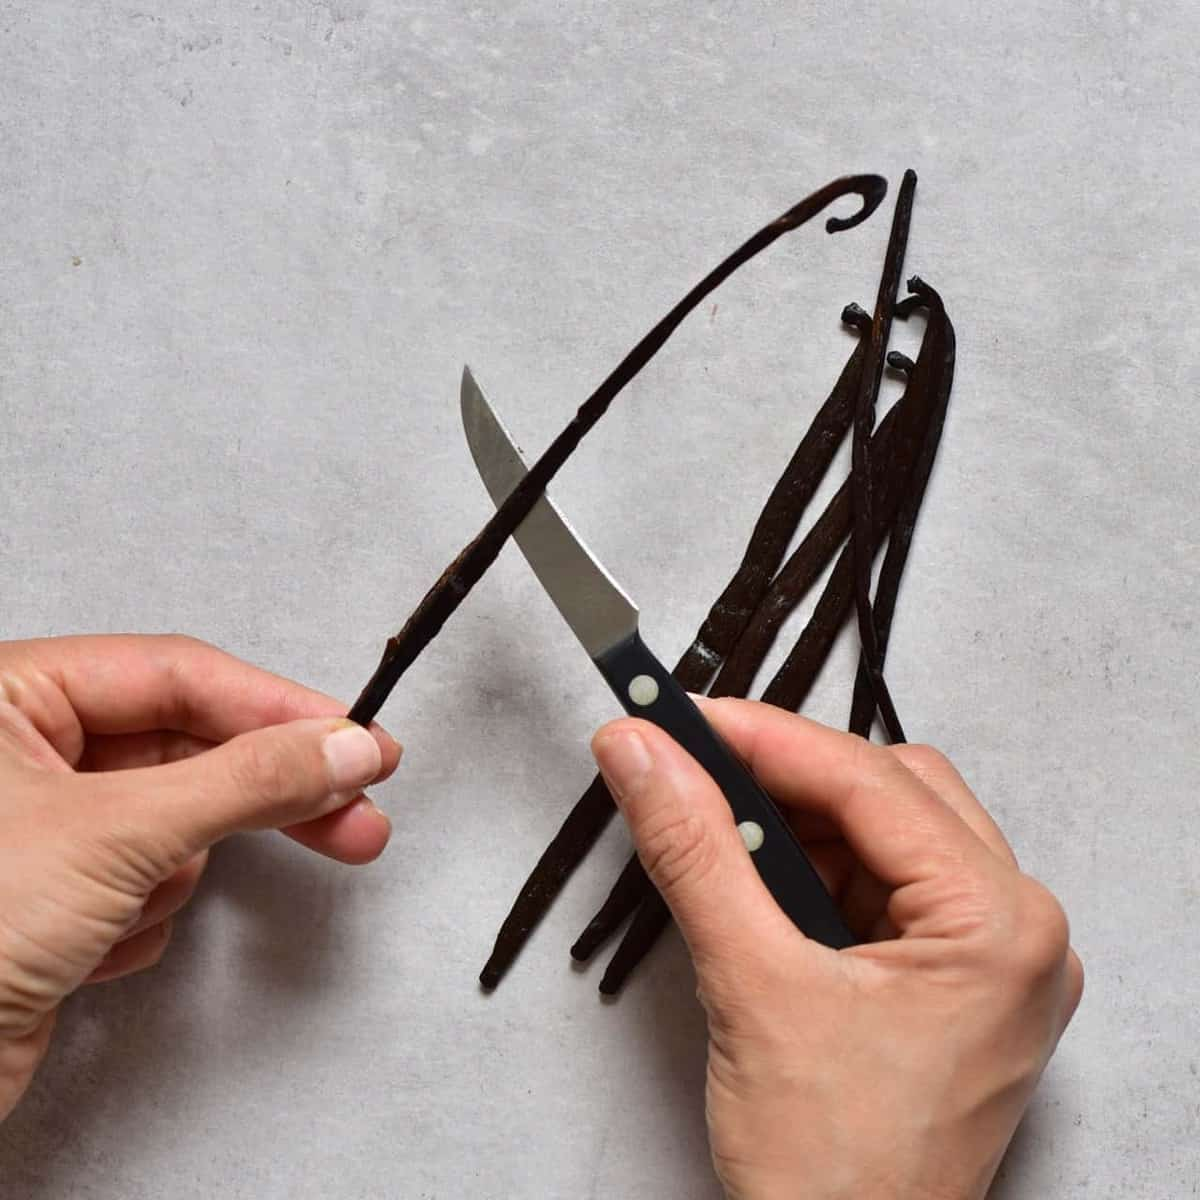 Cutting a vanilla pod with a knife